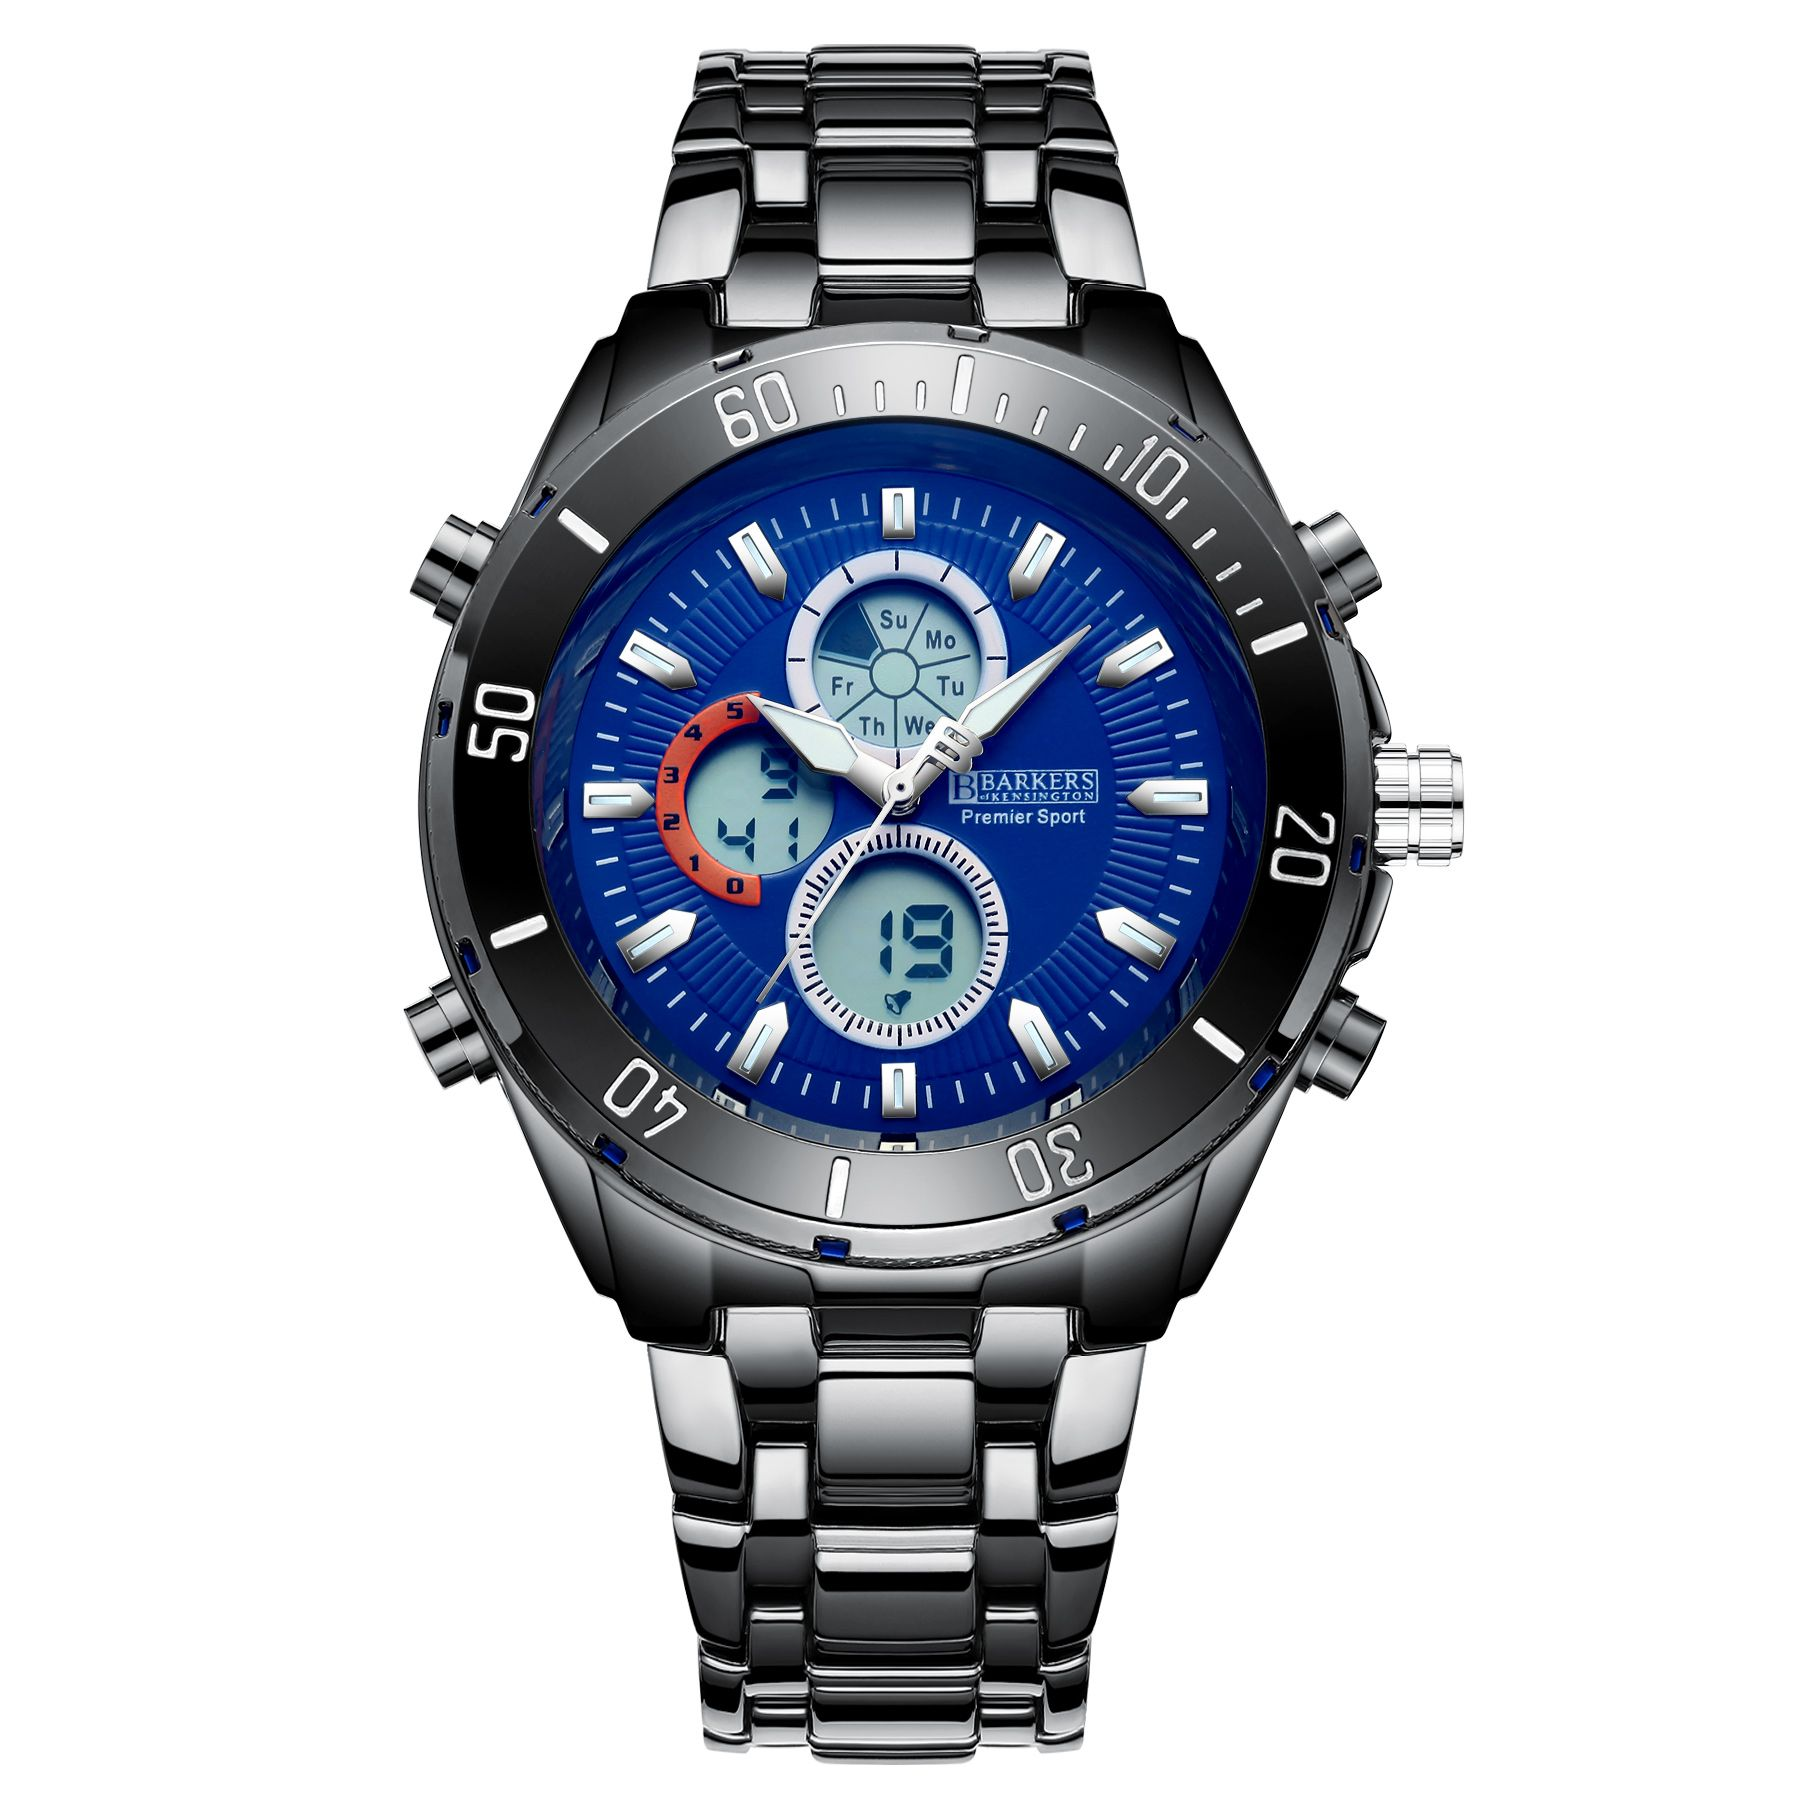 Barkers of Kensington Premier Sport Blue Mens Watch